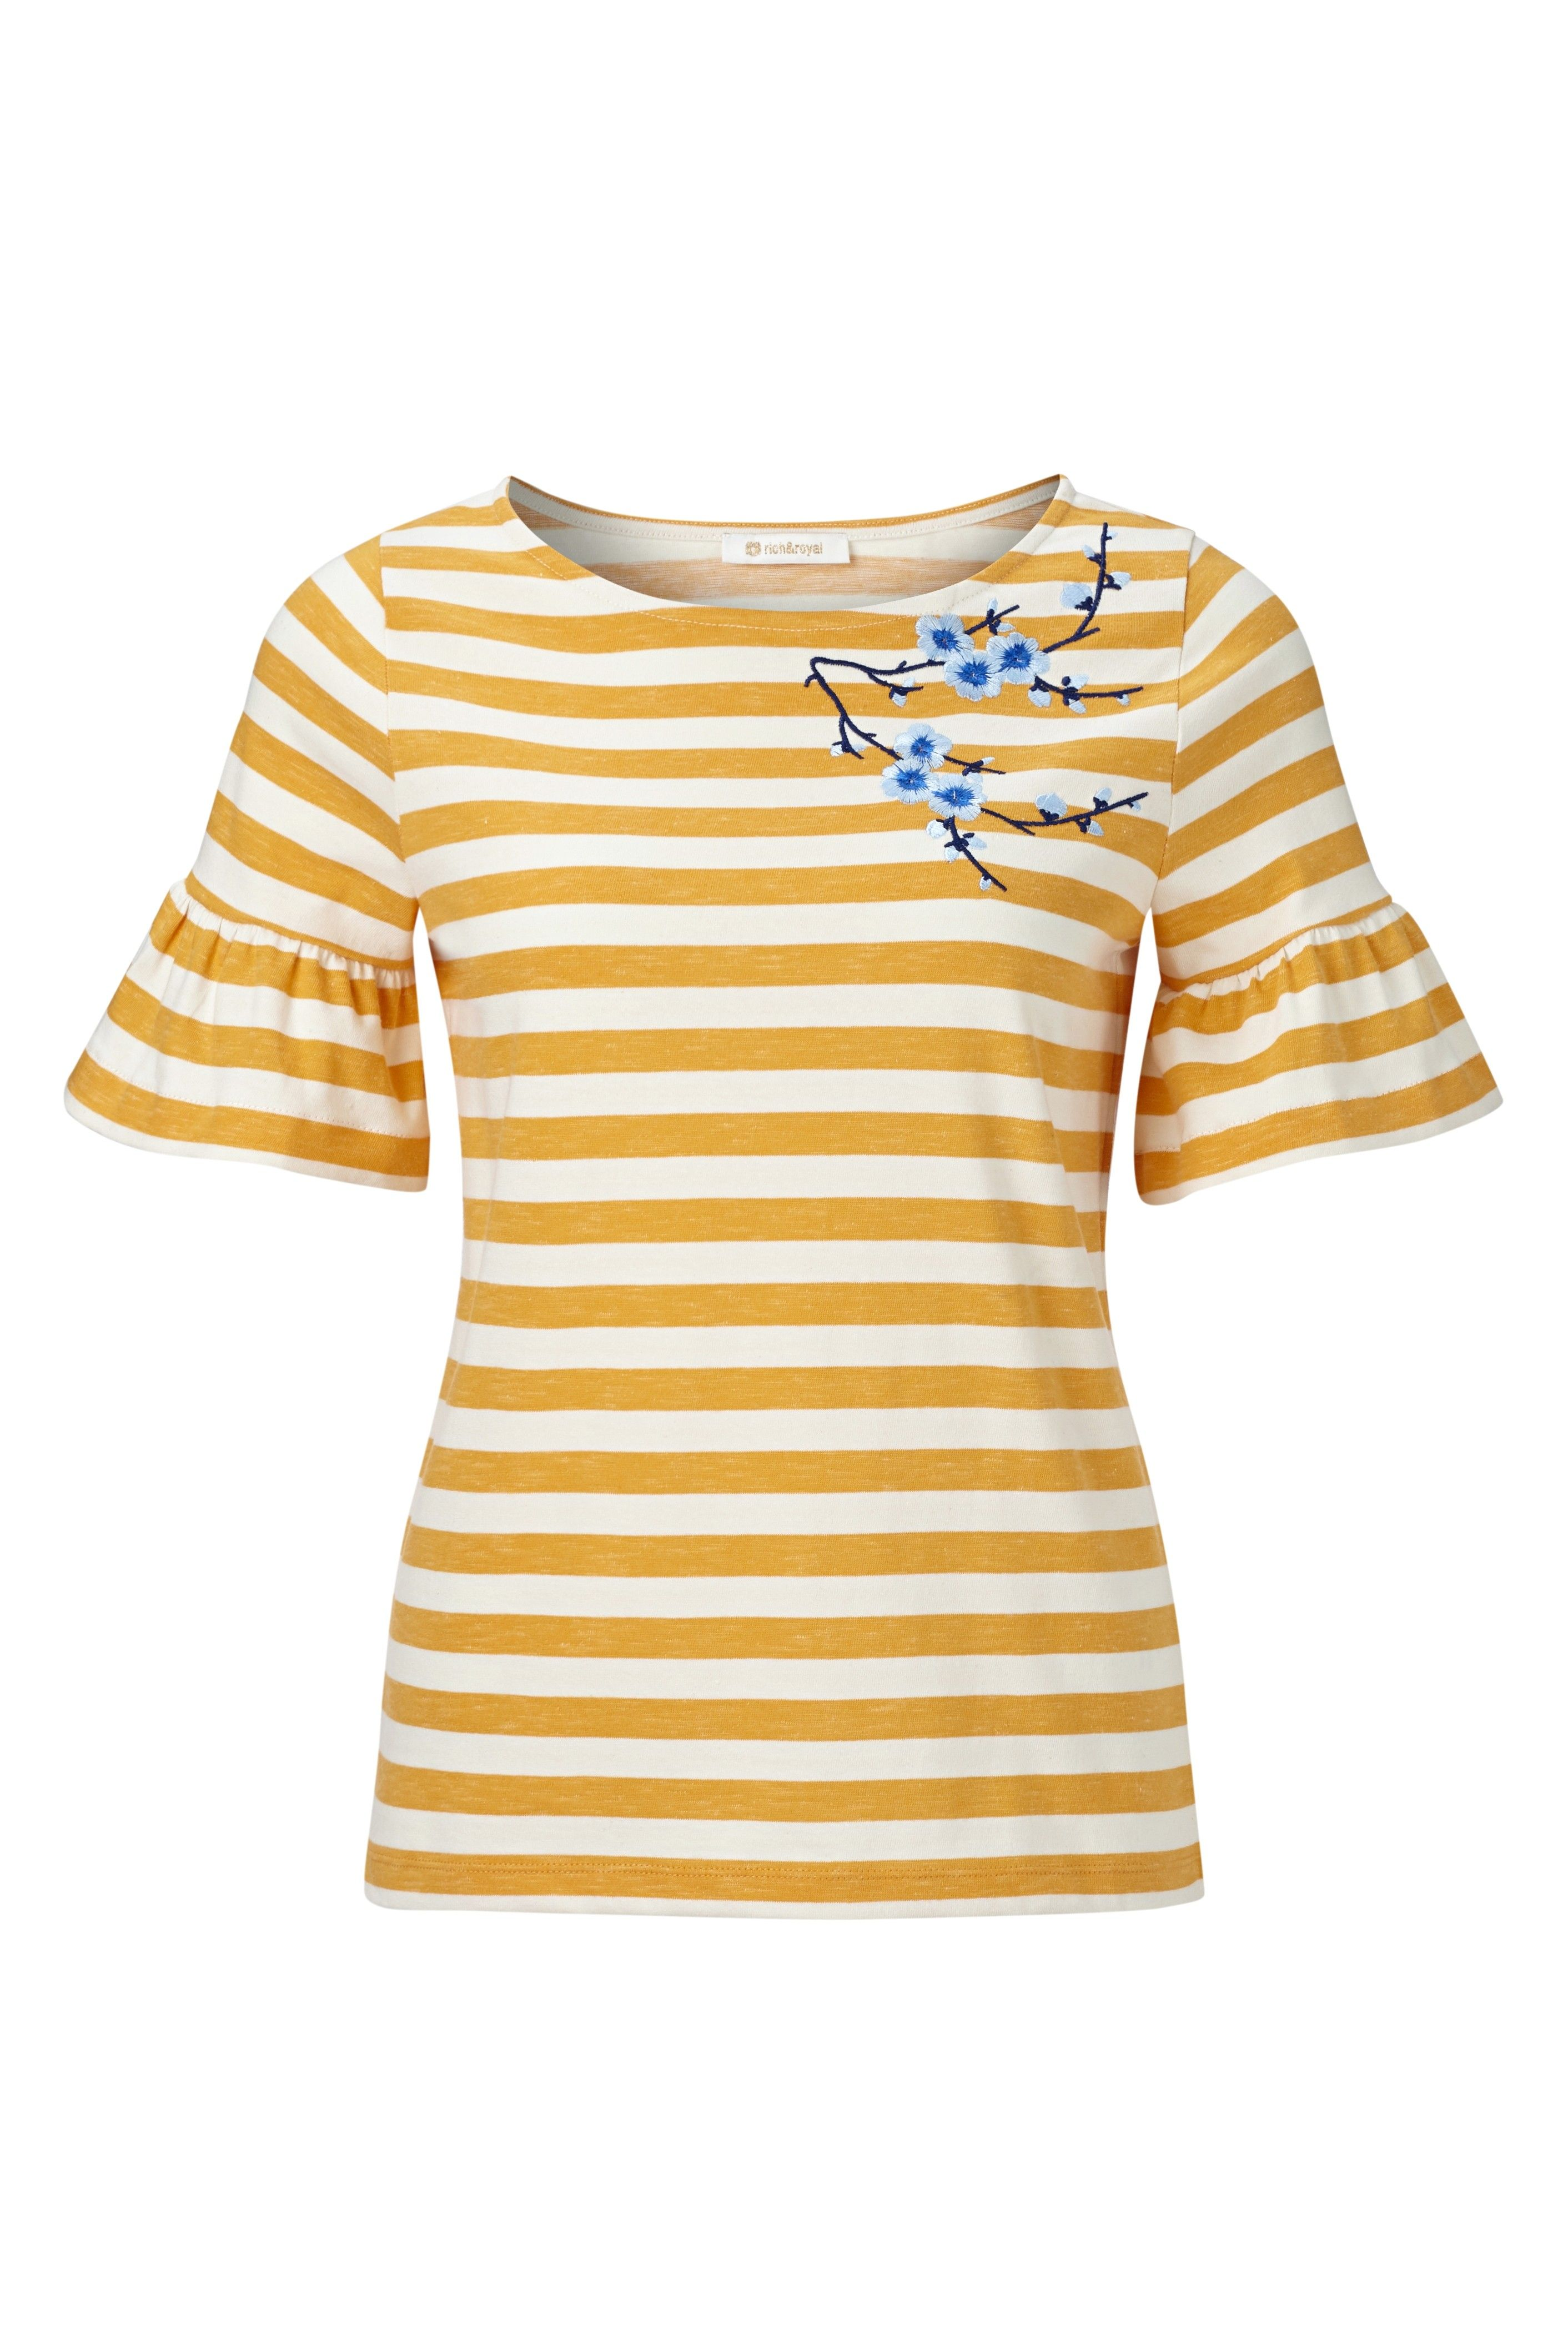 RICH & ROYAL - Damen T-Shirt - Orange Juice